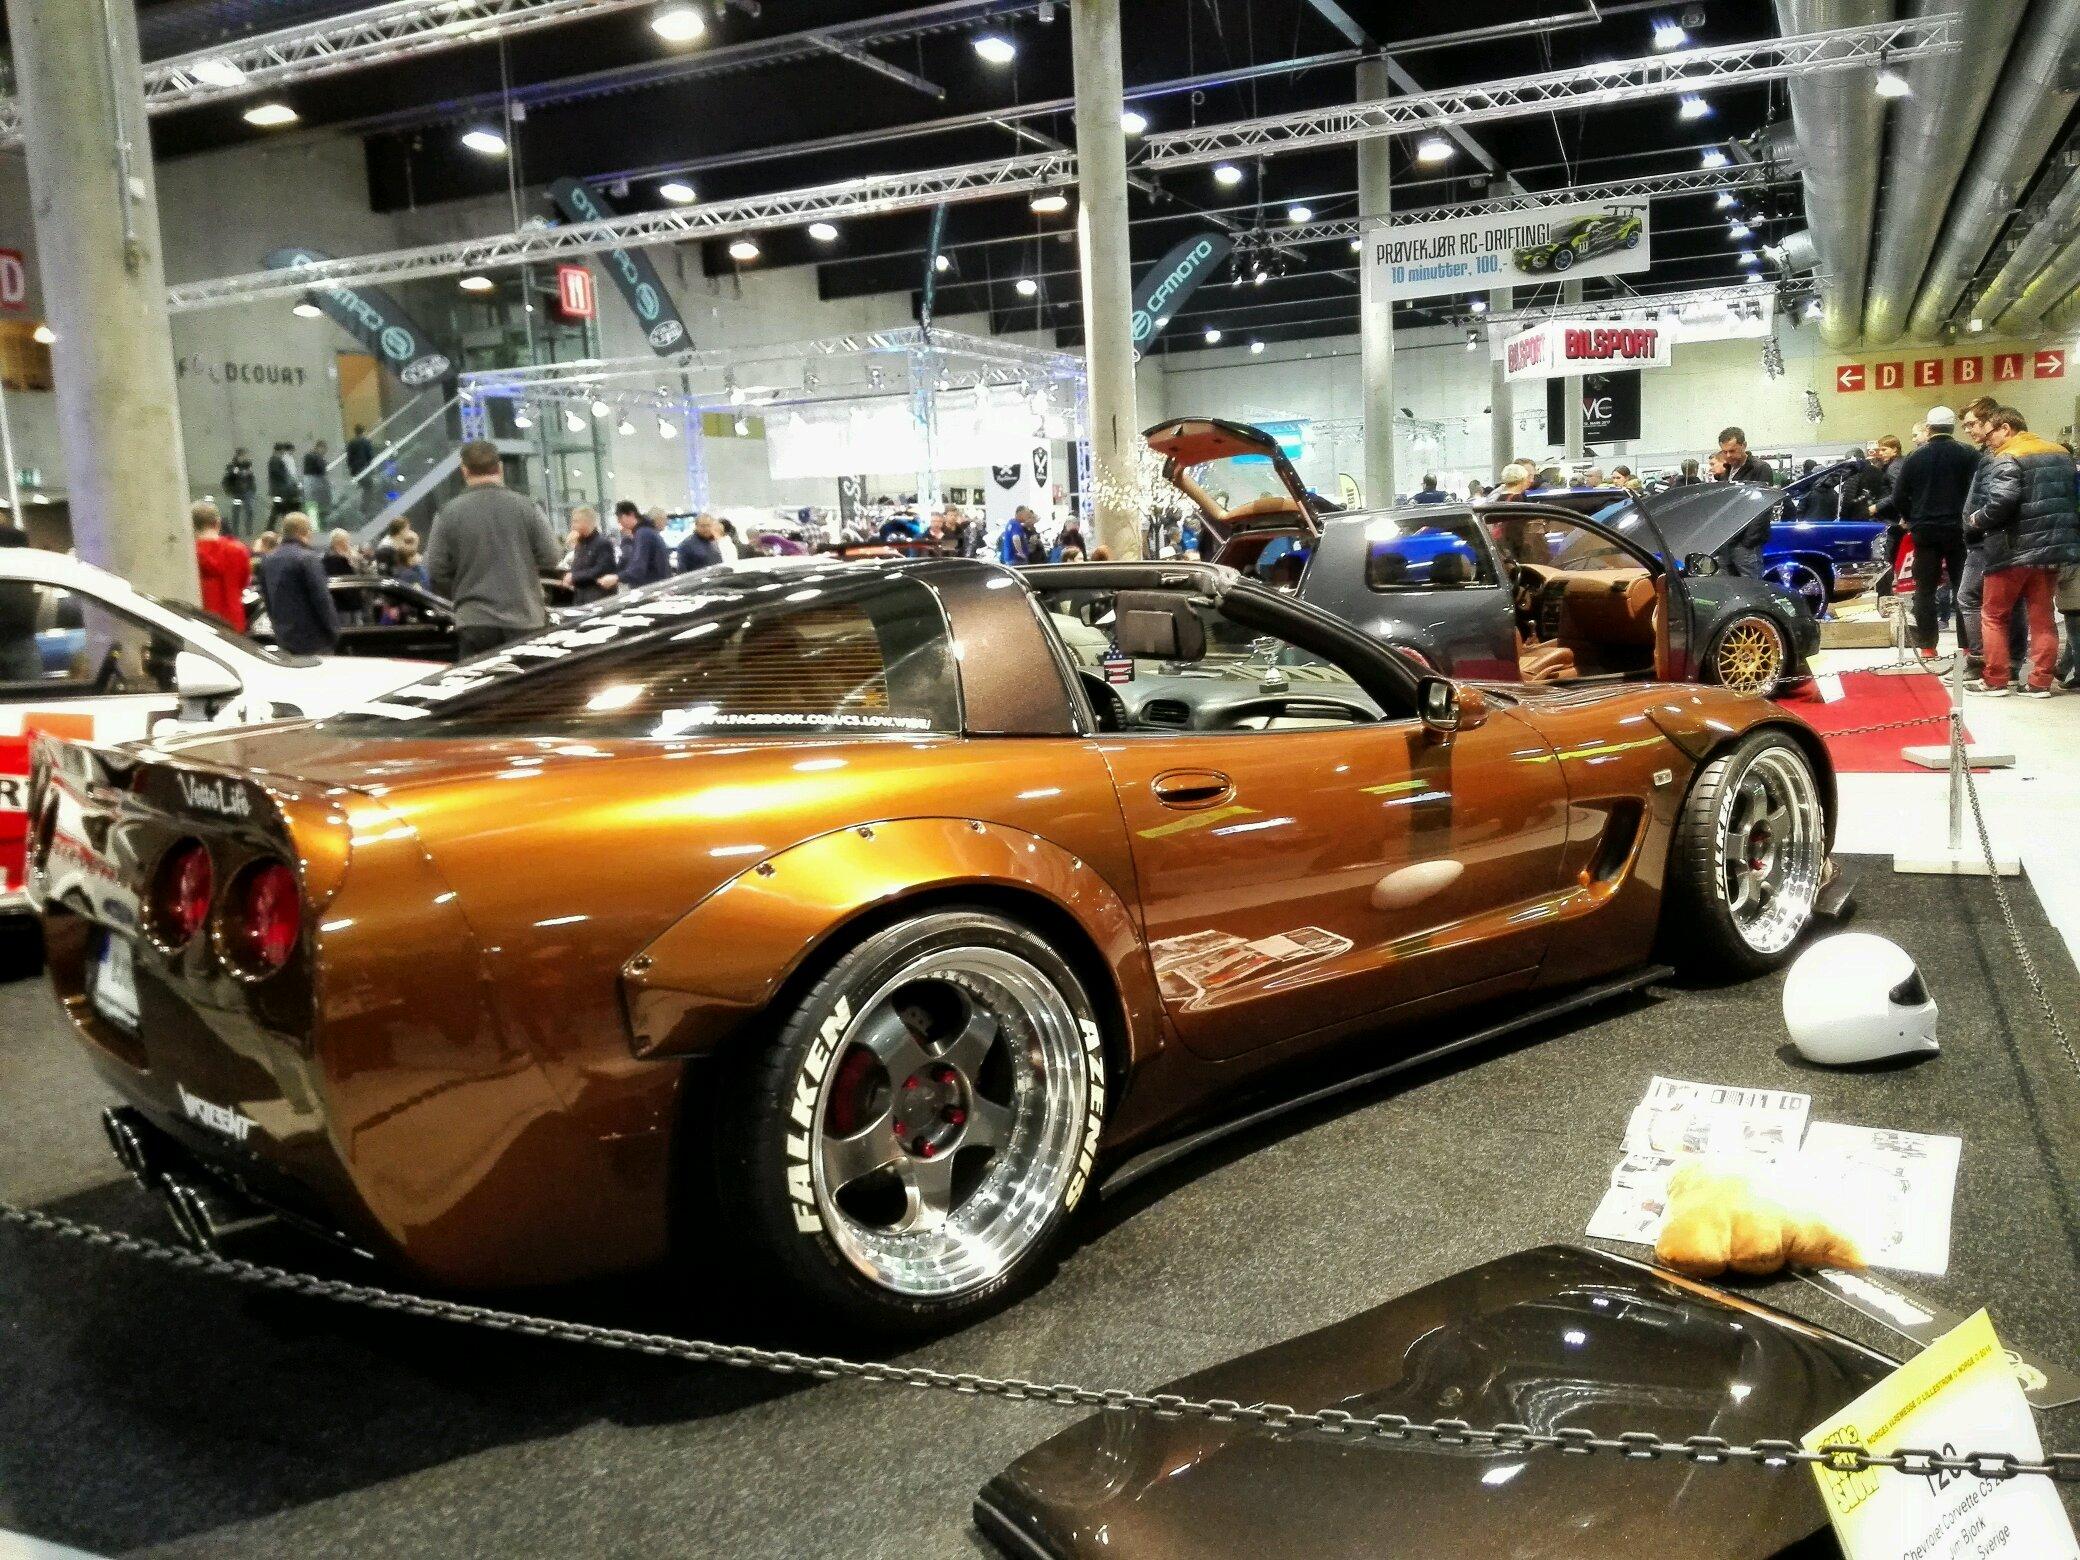 Stanced Corvette at Oslo Motorshow today